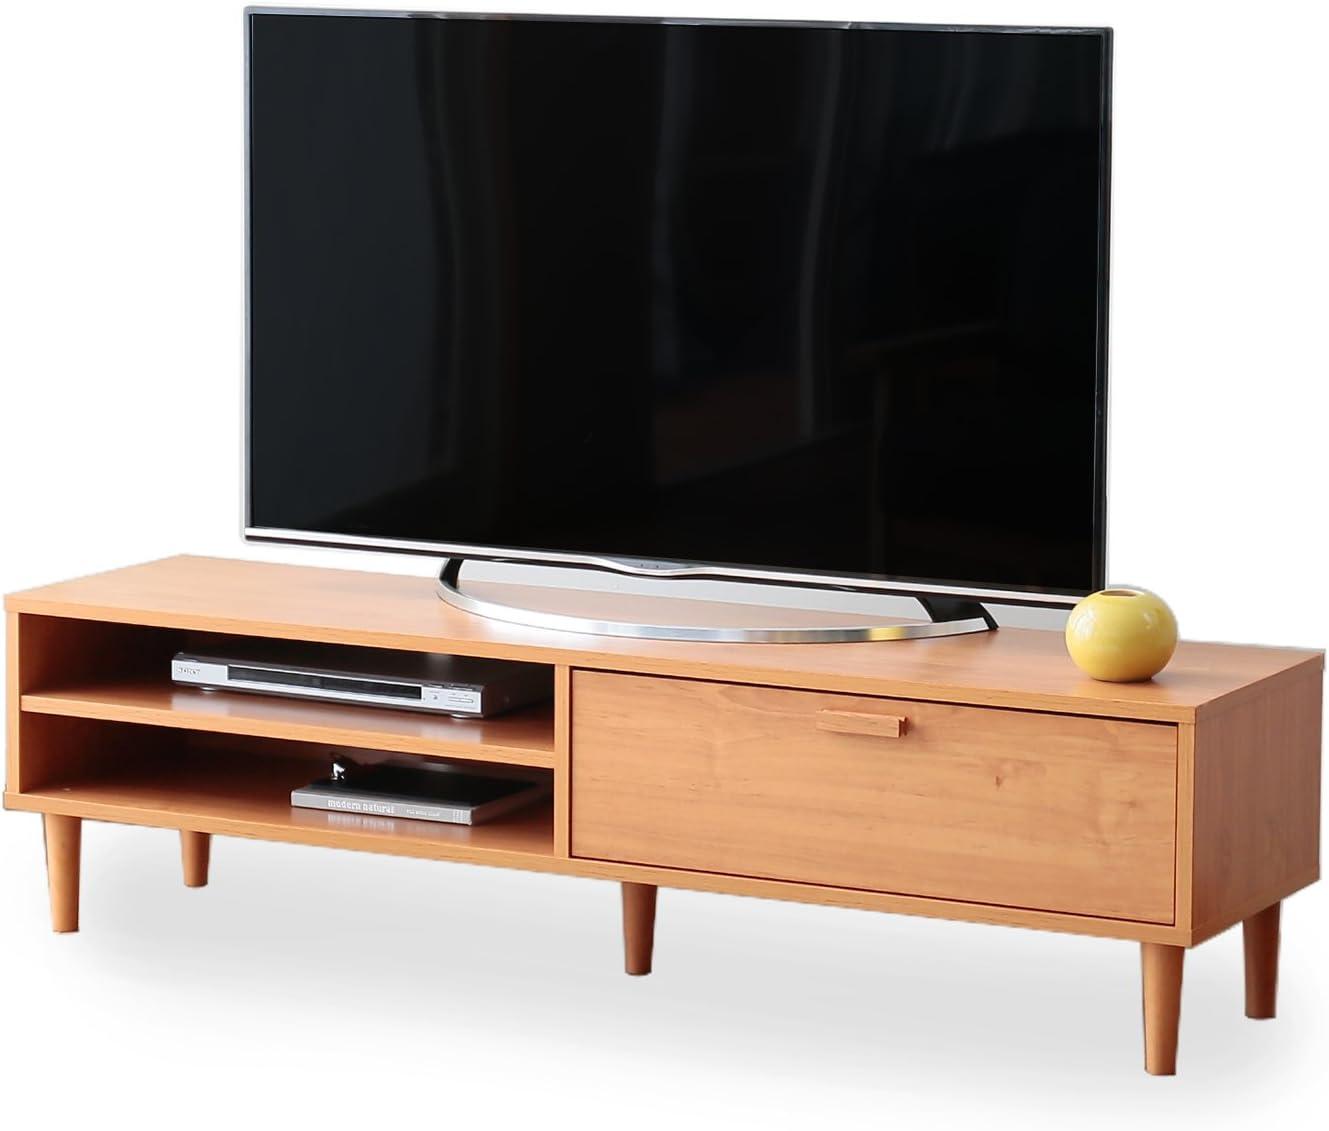 LOWYA (ロウヤ) TVボード テレビ台